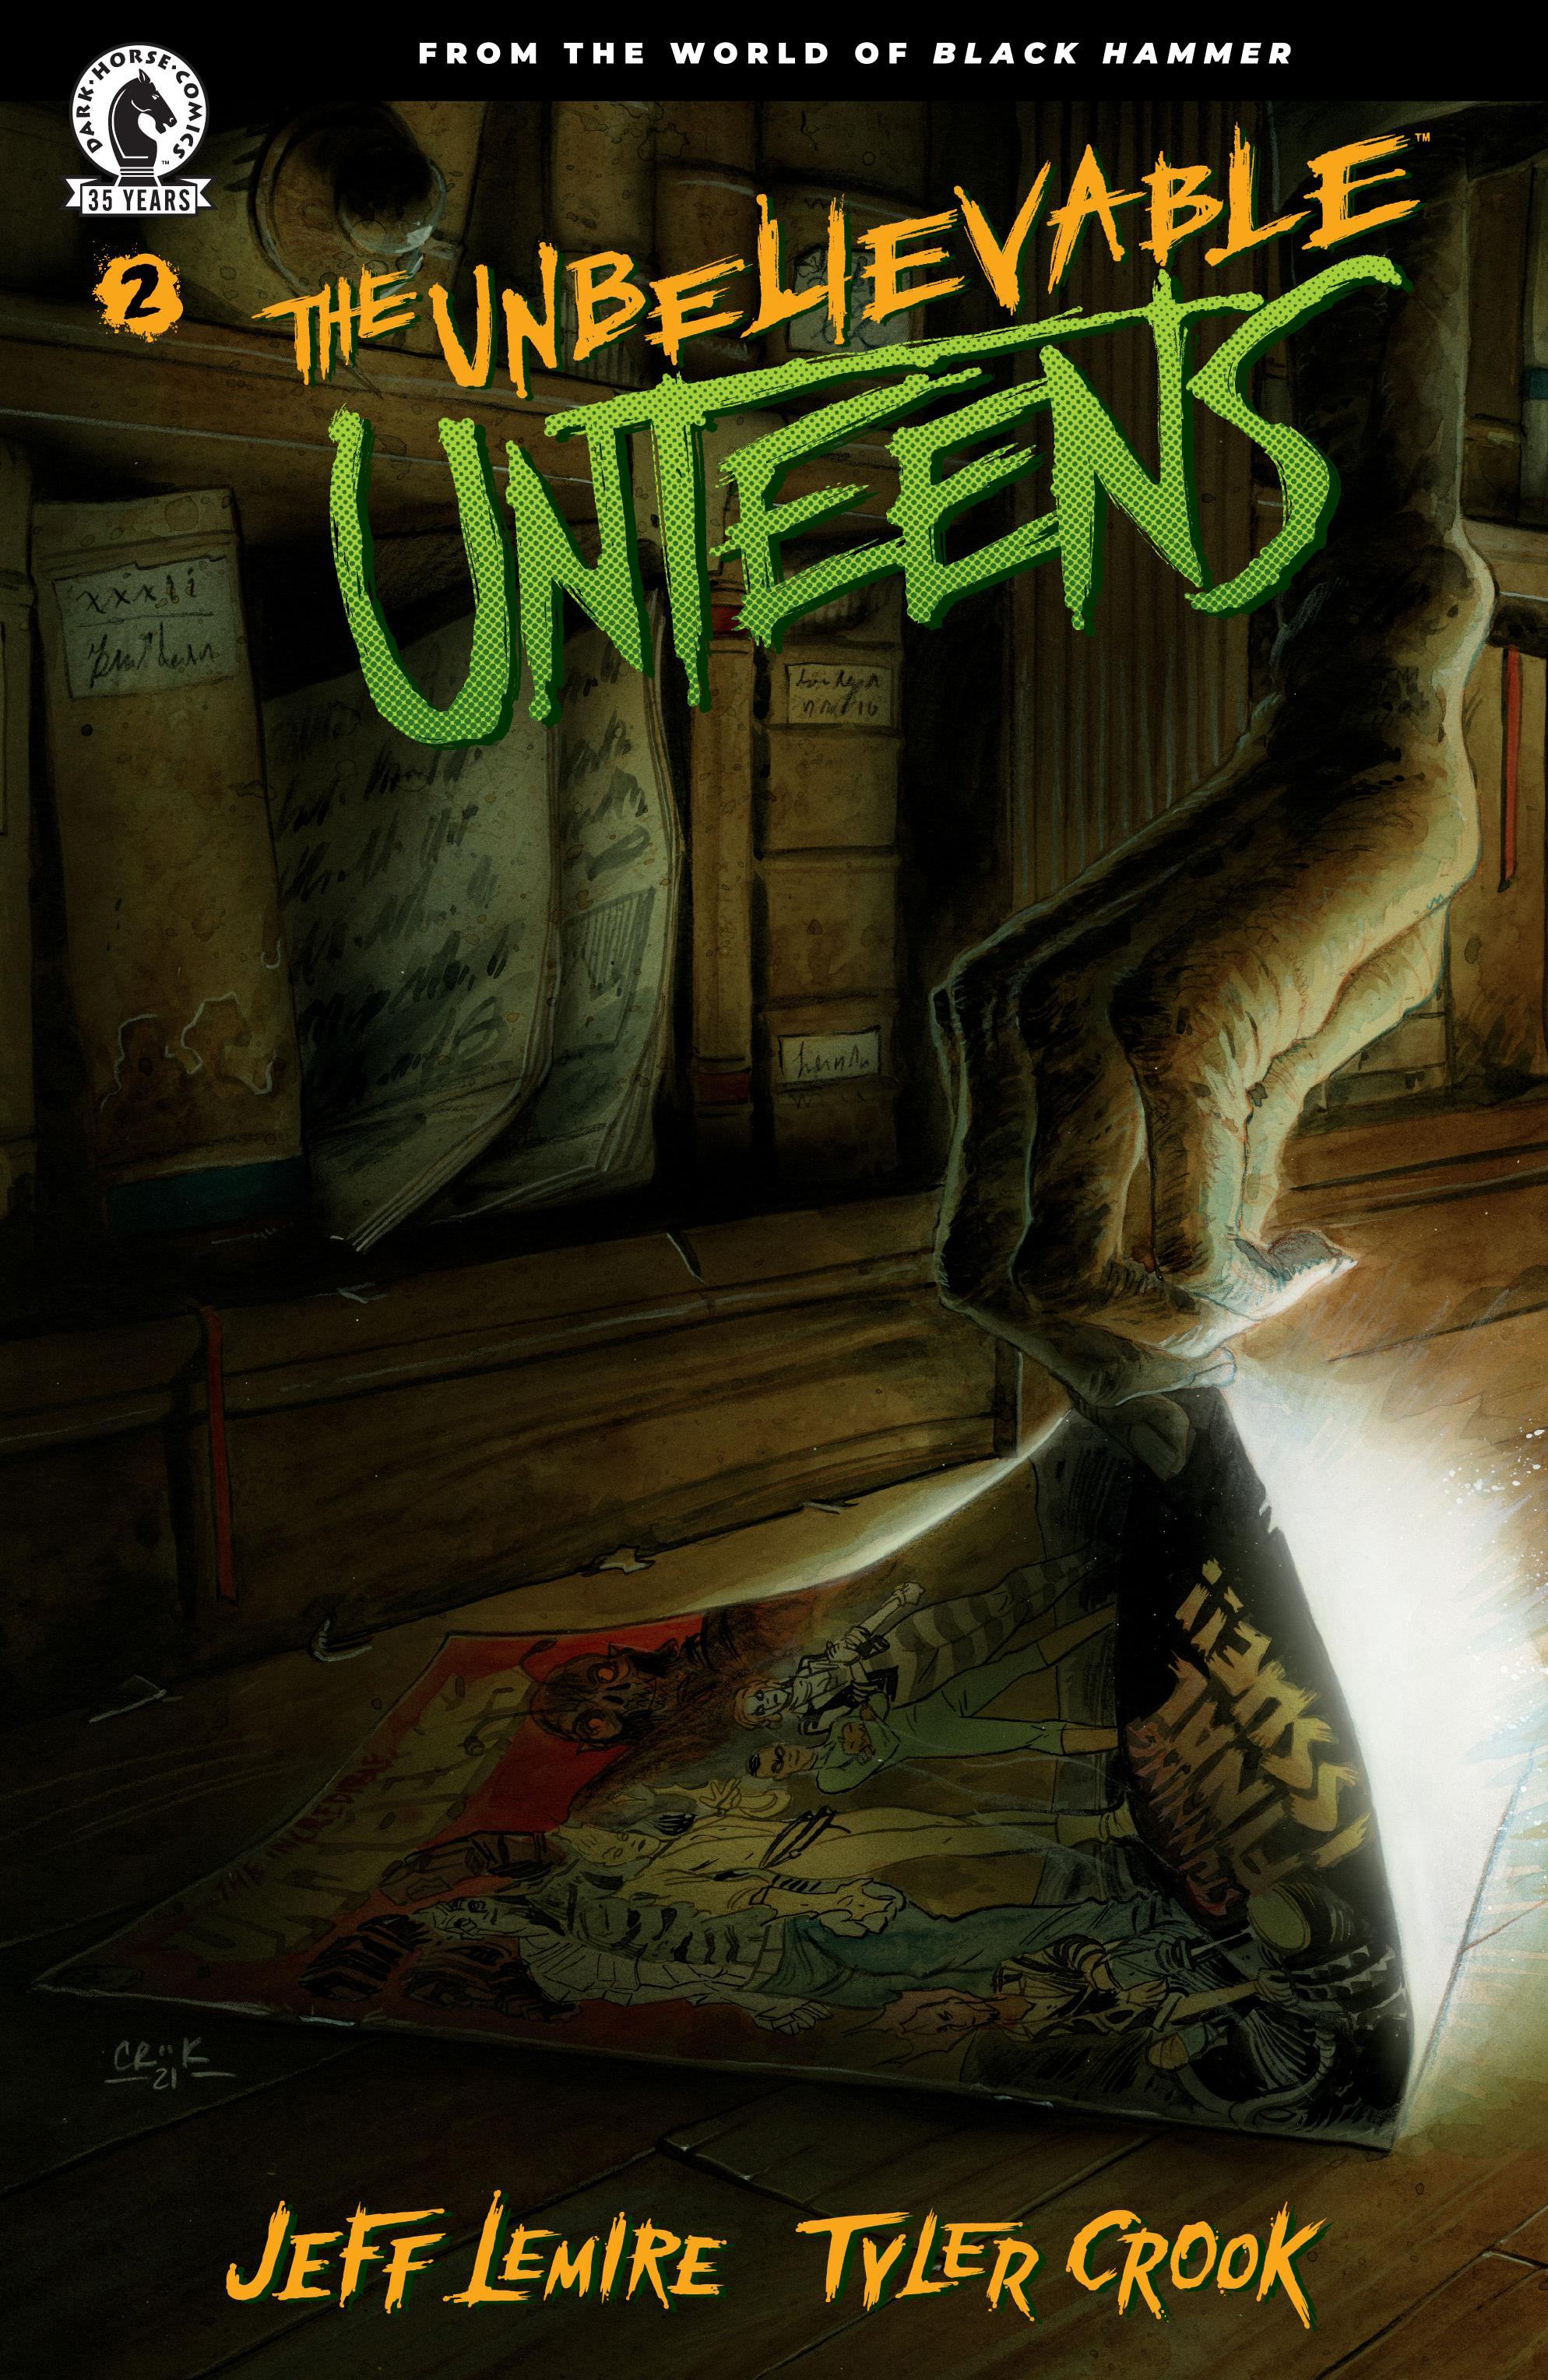 The Unbelievable Unteens 002 (2021) (digital) (Son of Ultron-Empire